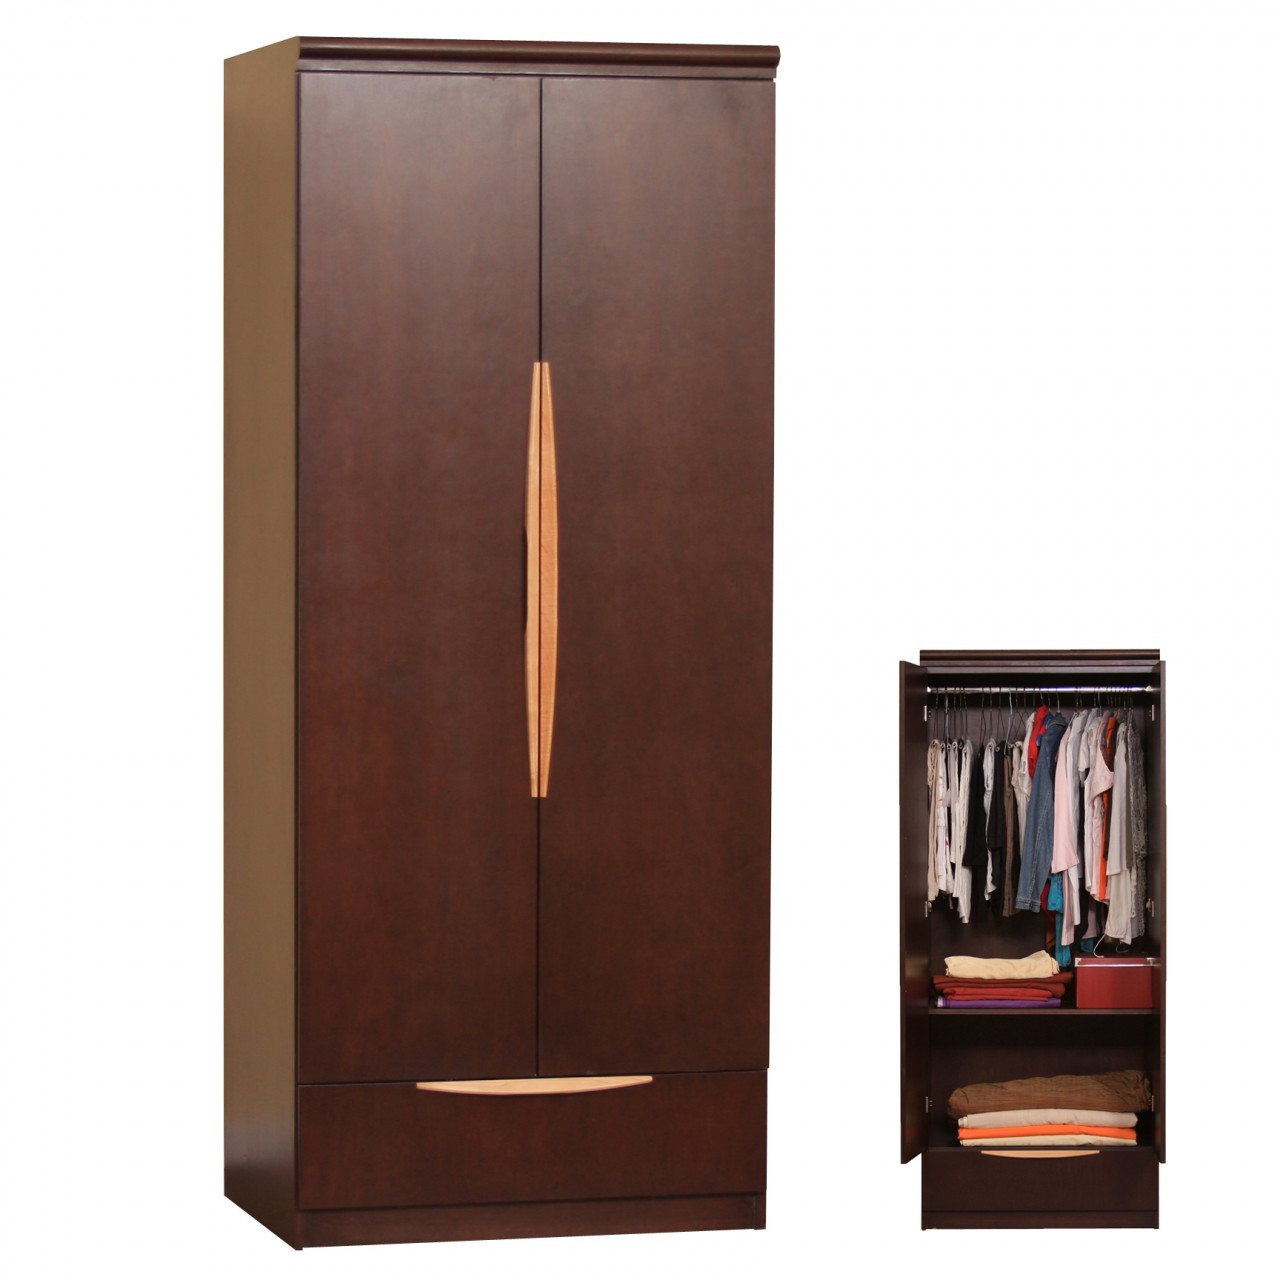 Wardrobe Closet Wardrobe Closet Shelf With Hanging Rod